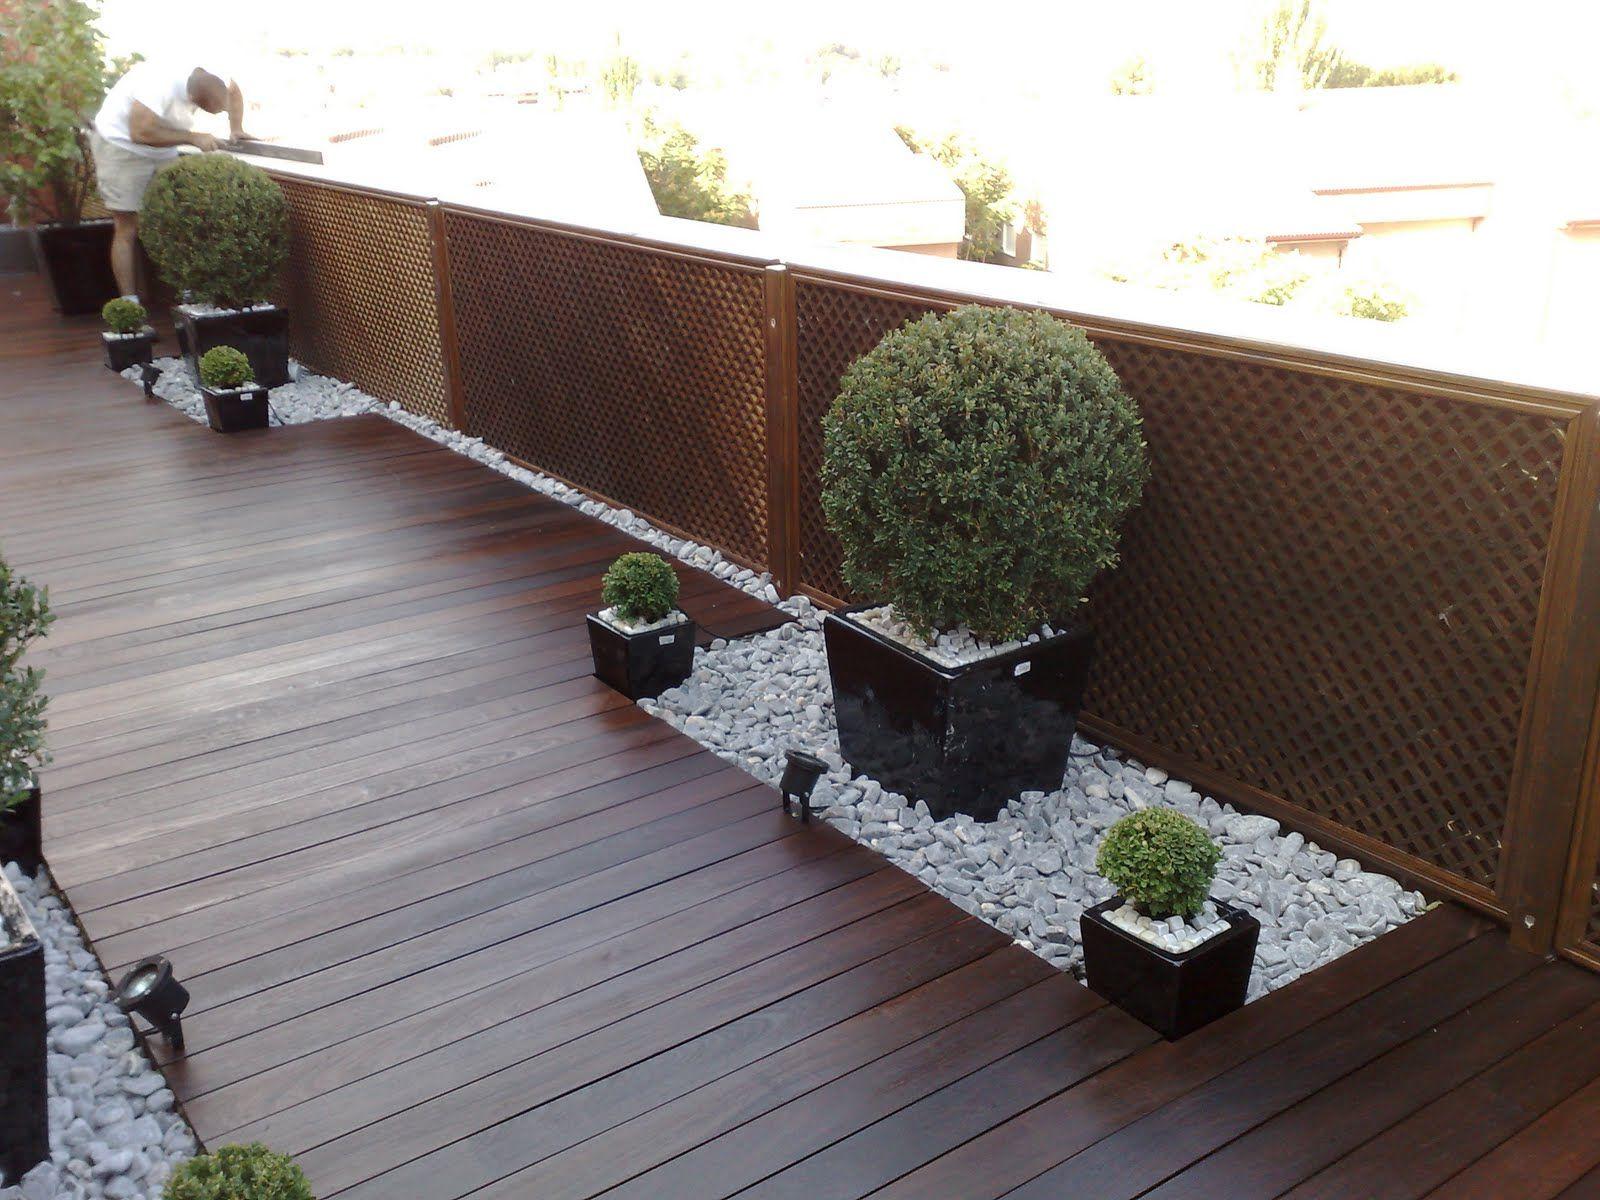 Jardines contemporaneos peque os inspiraci n de dise o for Jardines interiores pequenos minimalistas